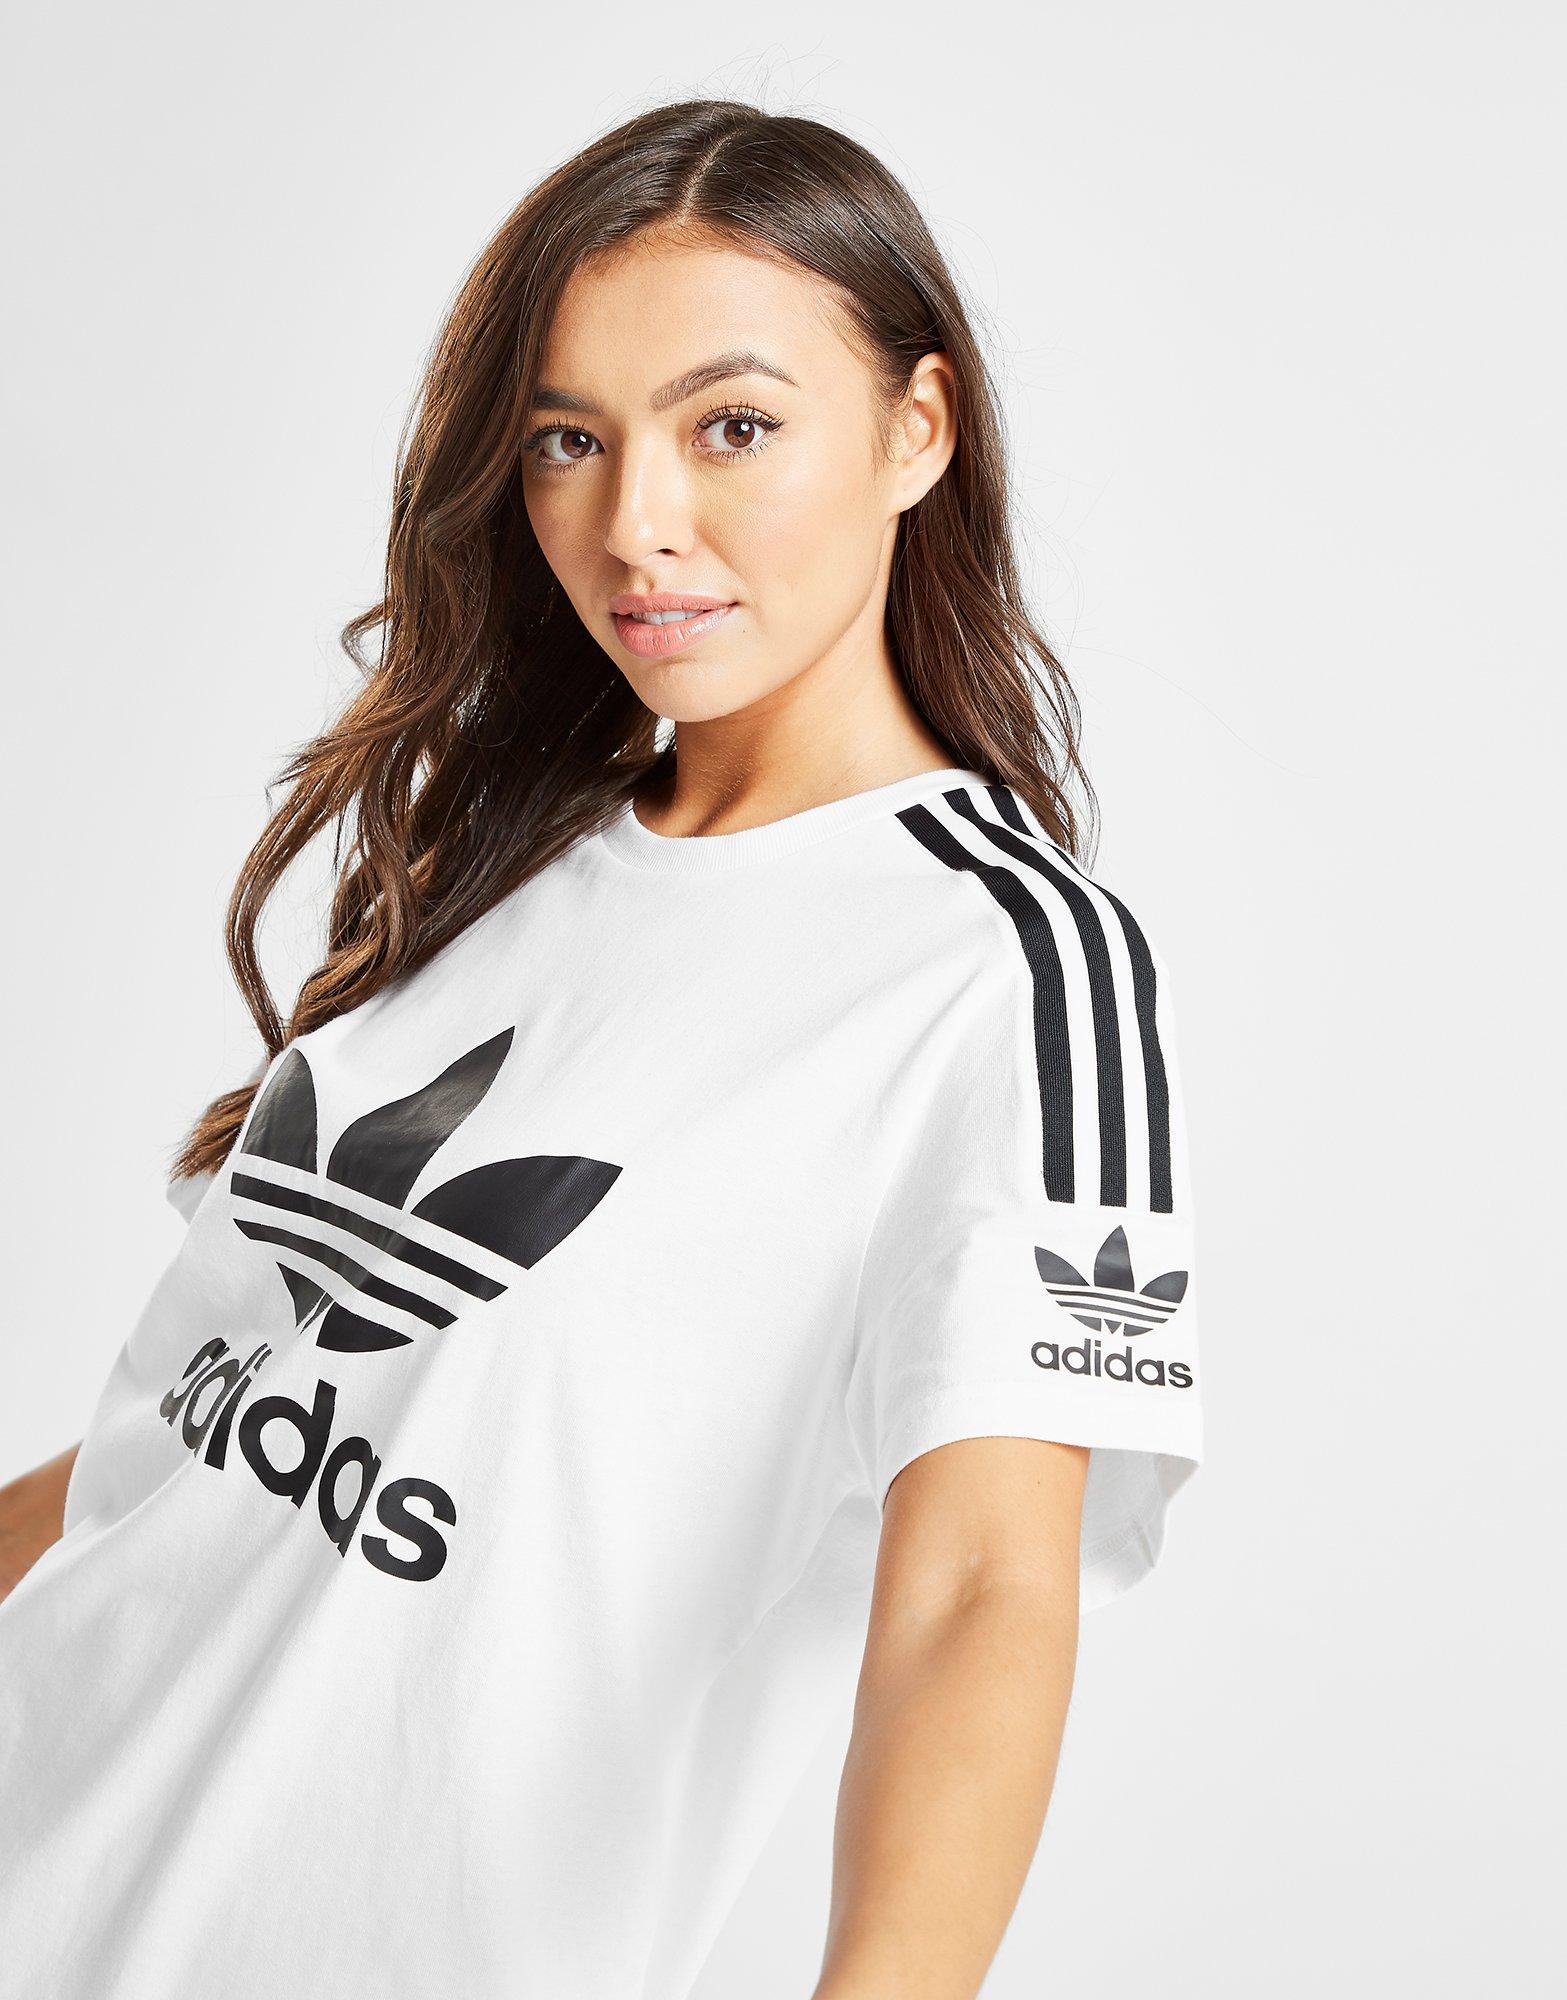 adidas t shirt jd